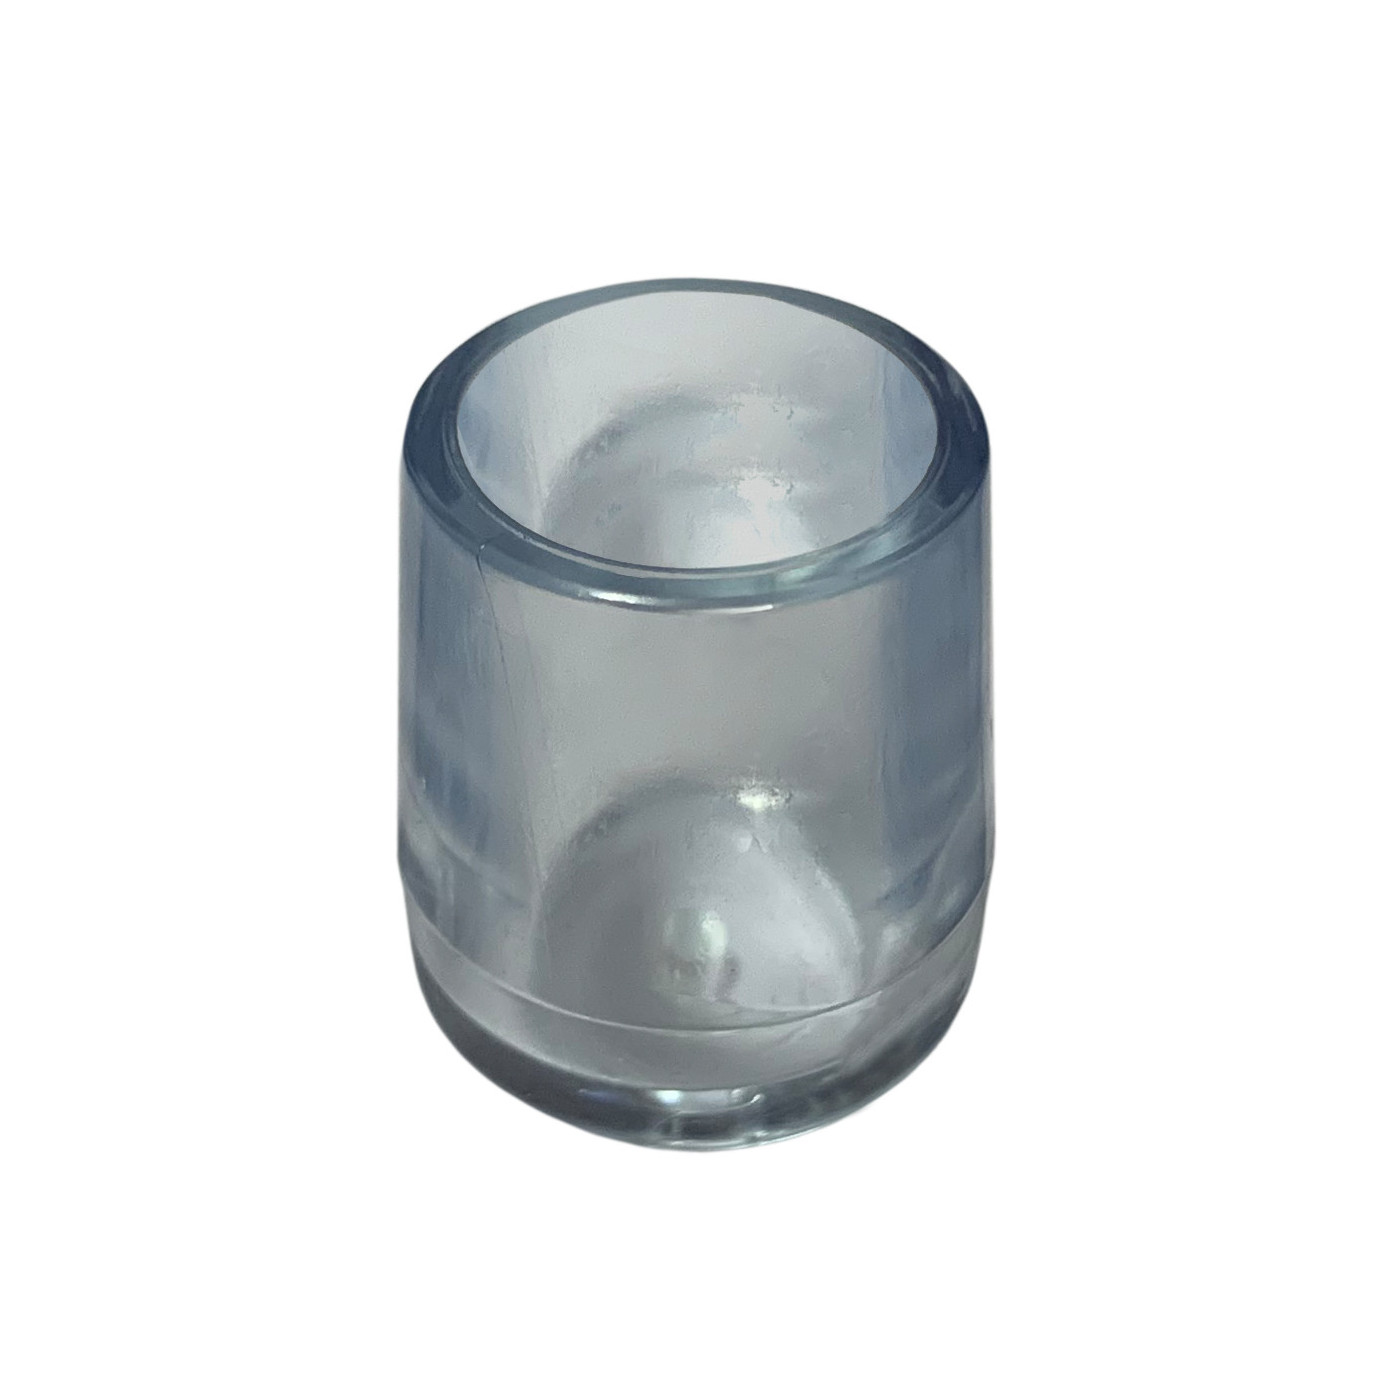 Set van 16 siliconen stoelpootdoppen (omdop, extra sterk, rond, 12.7 mm, transparant) [O-RO-12.7-T-X]  - 1